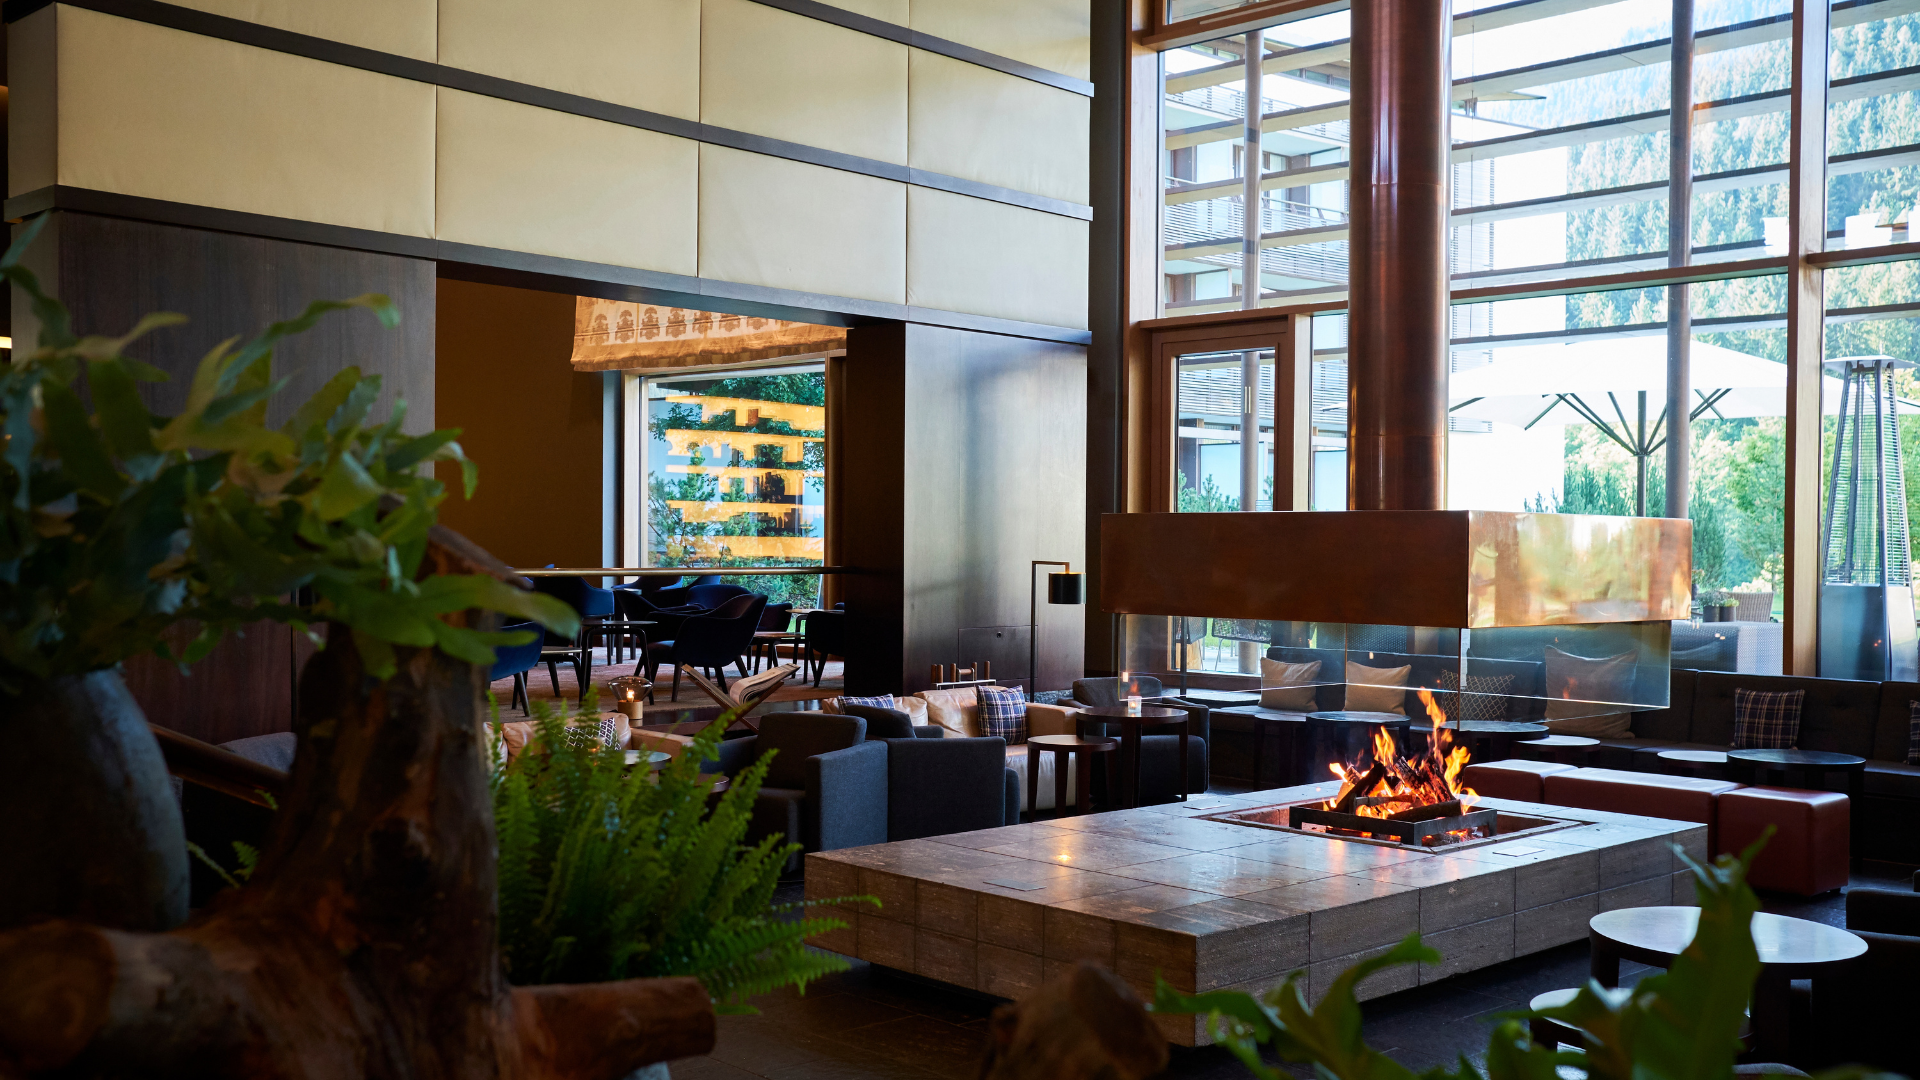 Kempinski Hotel Berchtesgaden Lobby Und Bar